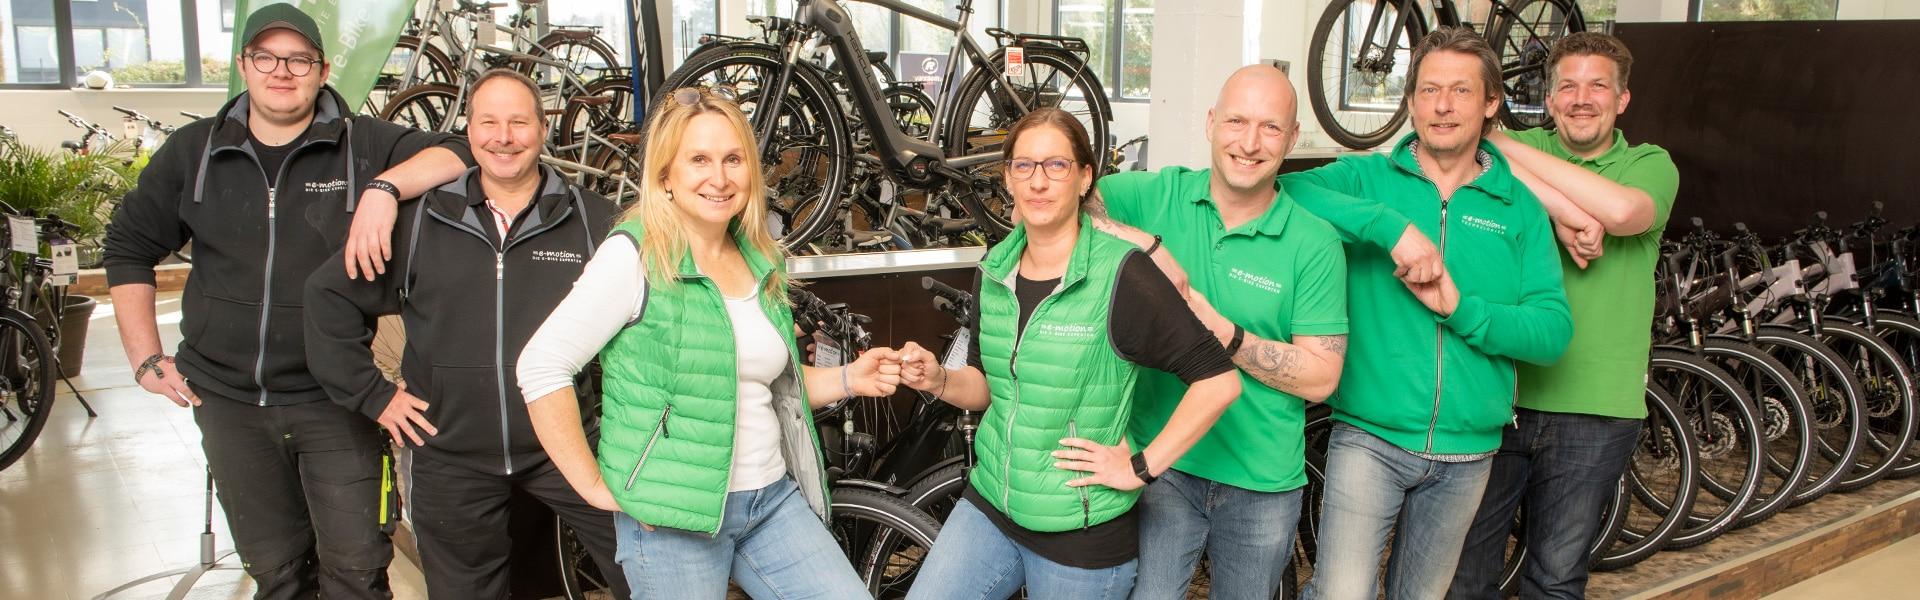 e-motion e-Bike Welt Bad Kreuznach Team Titelbild